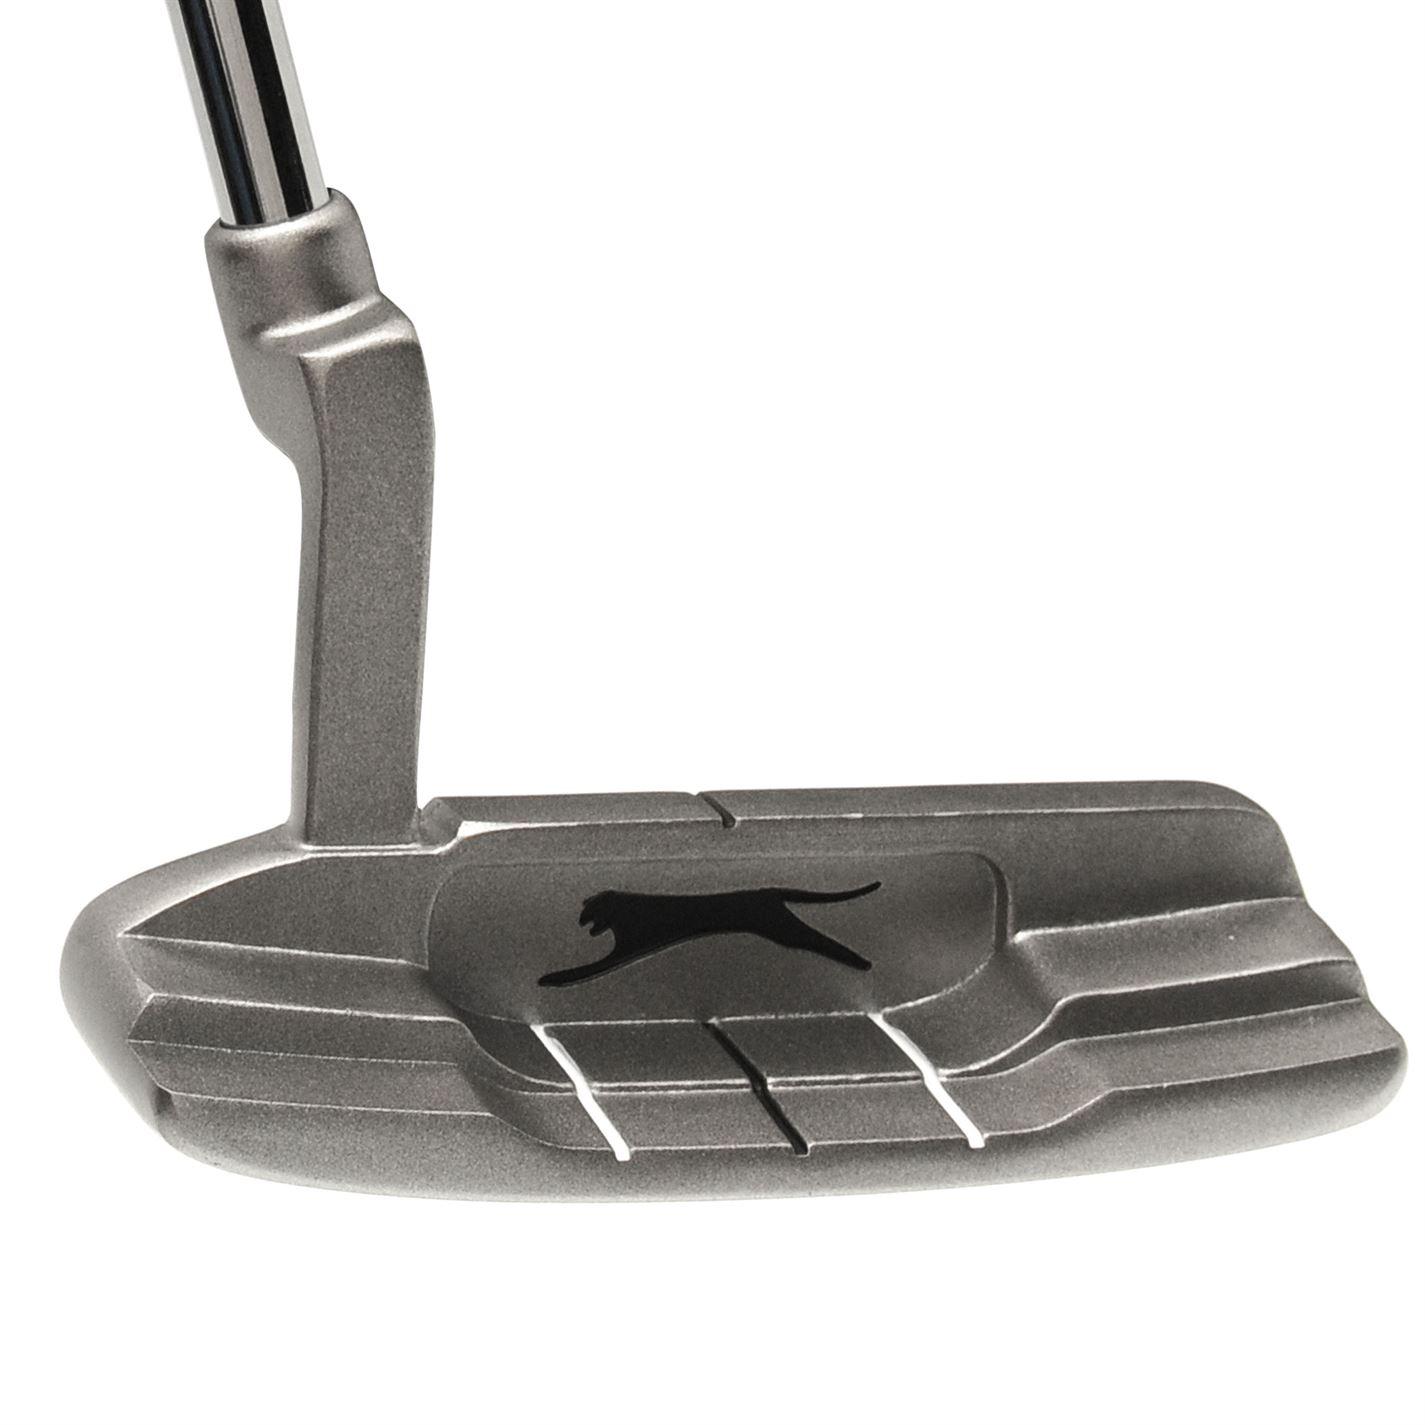 657bdf2dd53 Slazenger-V300-Golf-Set-Unisex-Graphite thumbnail 11